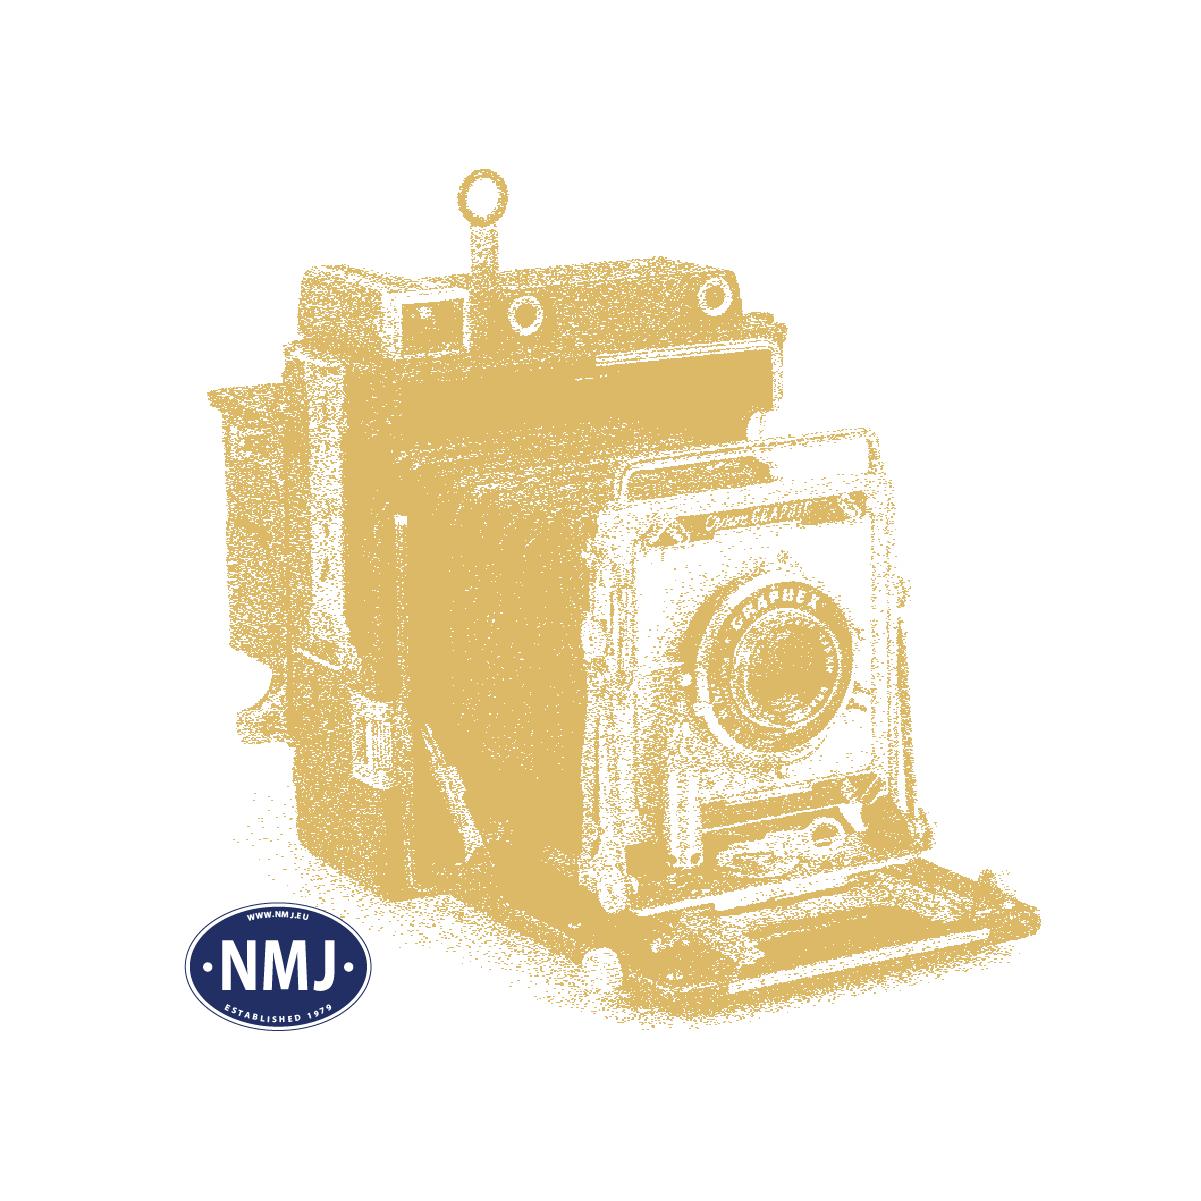 NMJTKAT17 - NMJ Katalogpaket 2017, NMJ Superline, Topline und Skyline